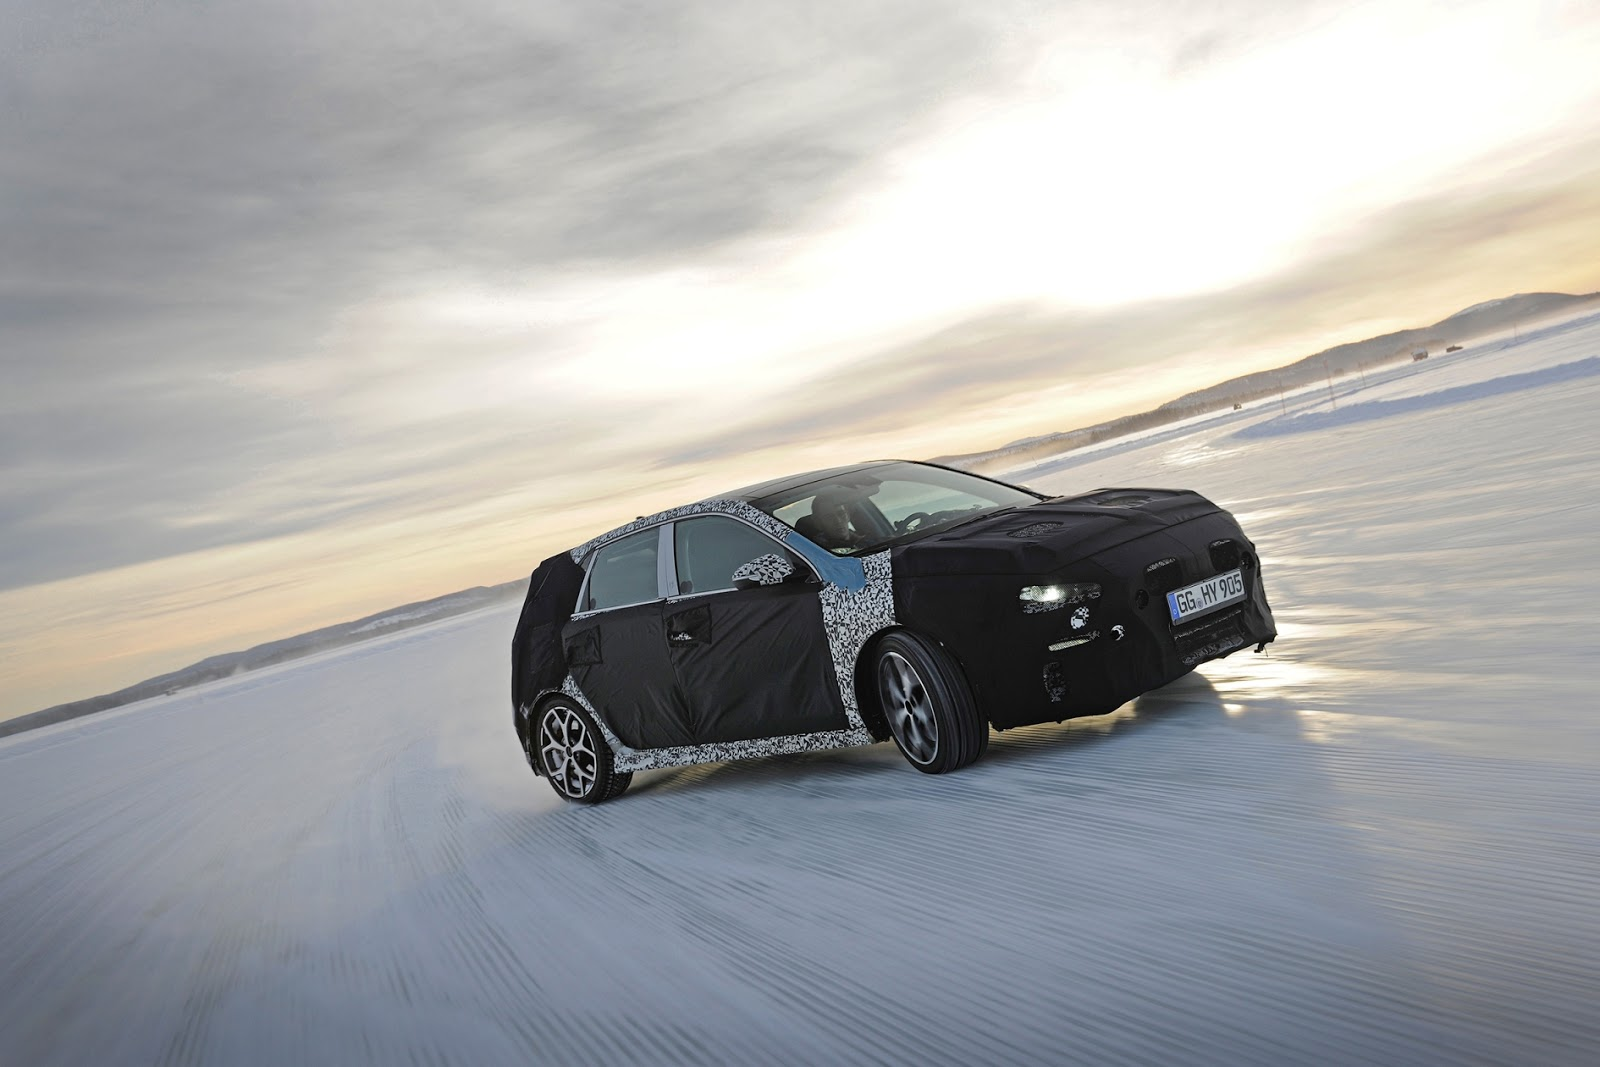 Hyundai2Bi302BN2BWinter2BTesting2BSweden 2 Δες τις δοκιμές του Hyundai i30Ν σε μια παγωμένη λίμνη Hyundai, Hyundai i30, hyundai i30n, Hyundai N, Hyundai Ελλάς, video, videos, zblog, βίντεο